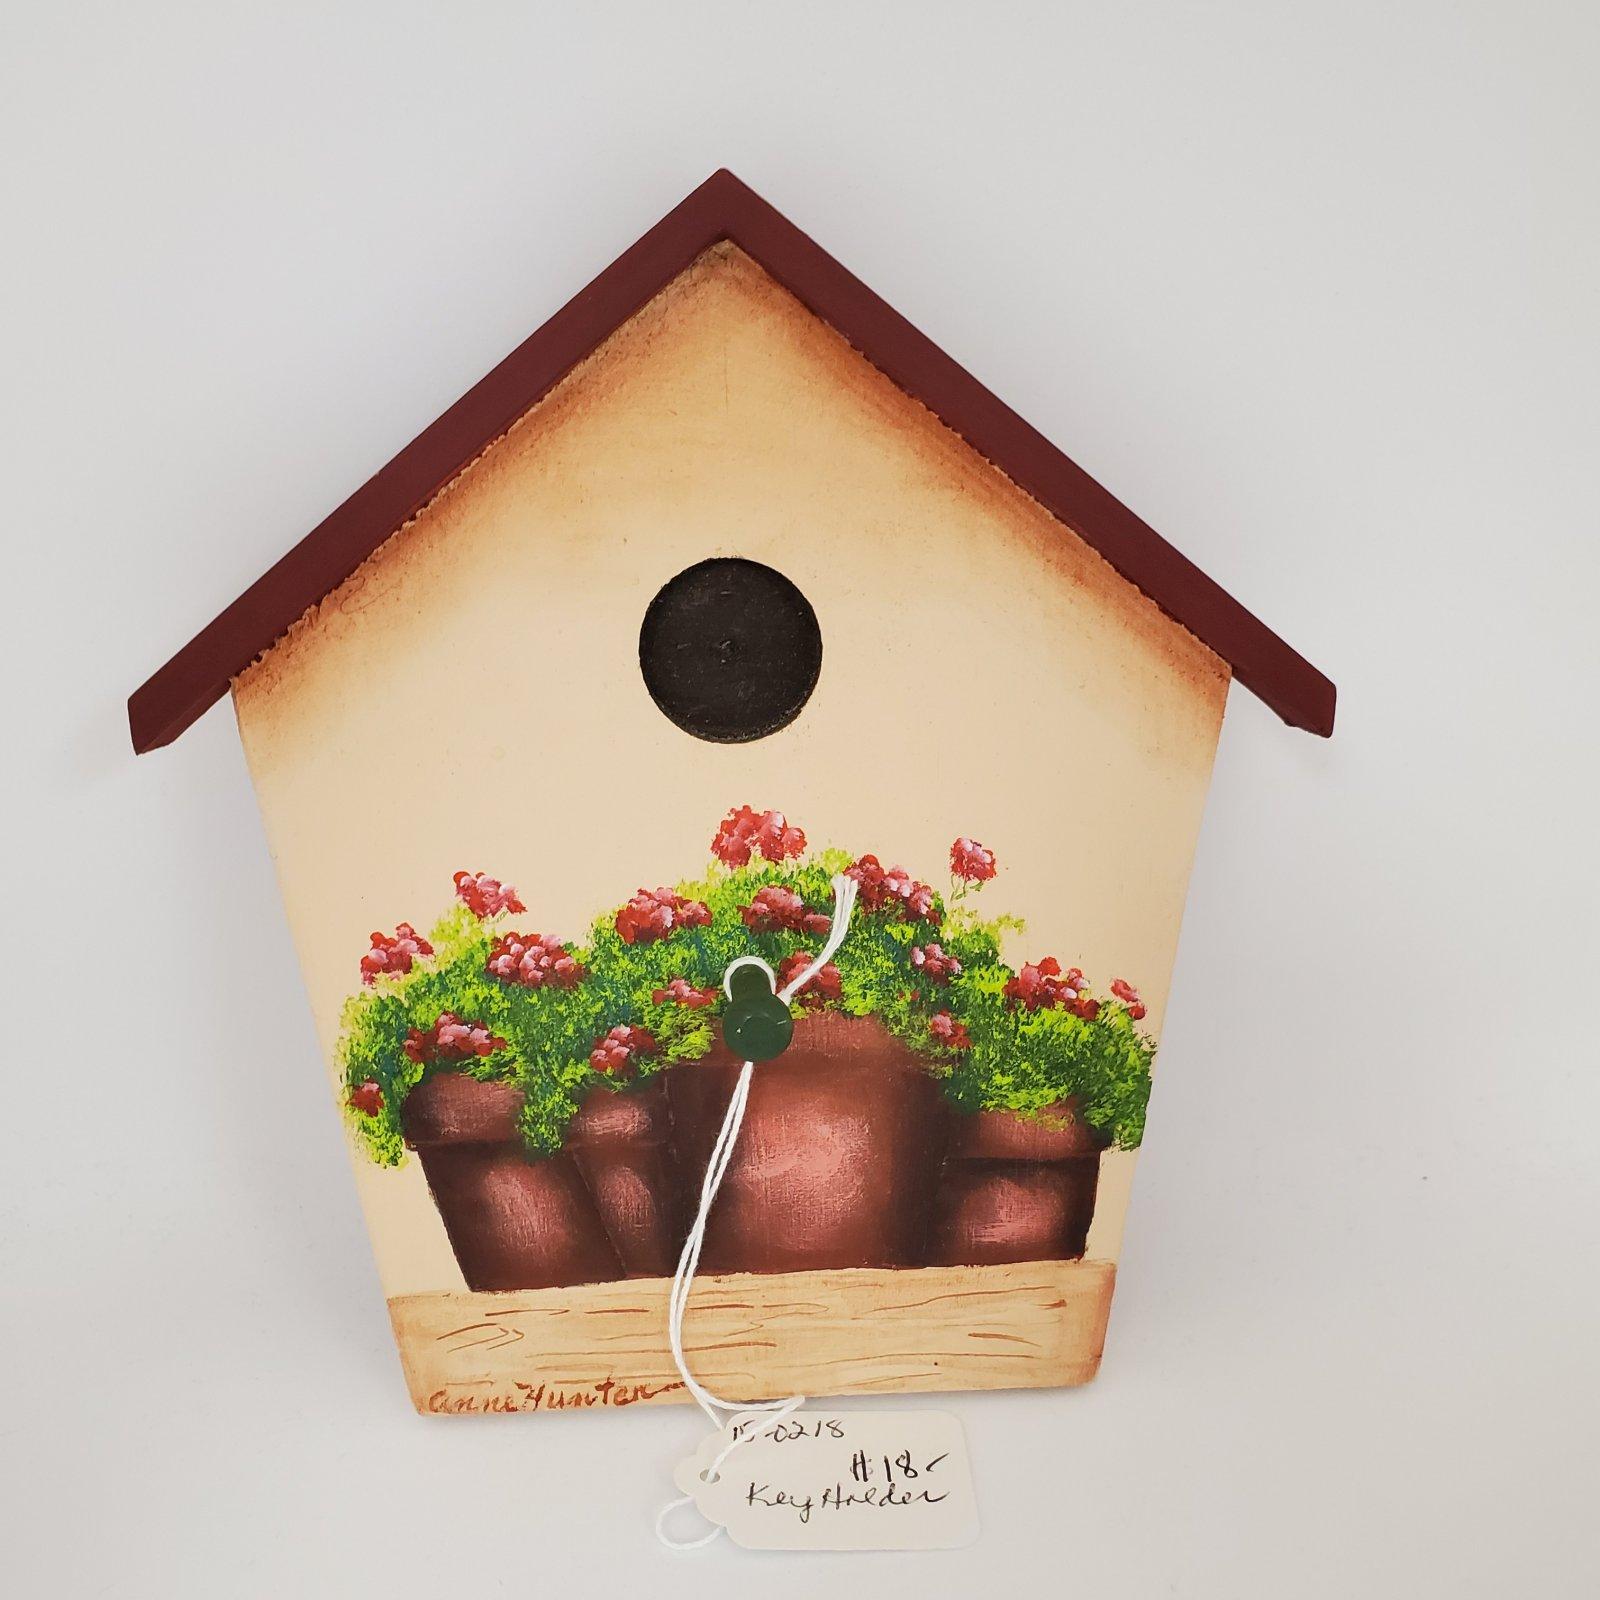 15 -house key holder